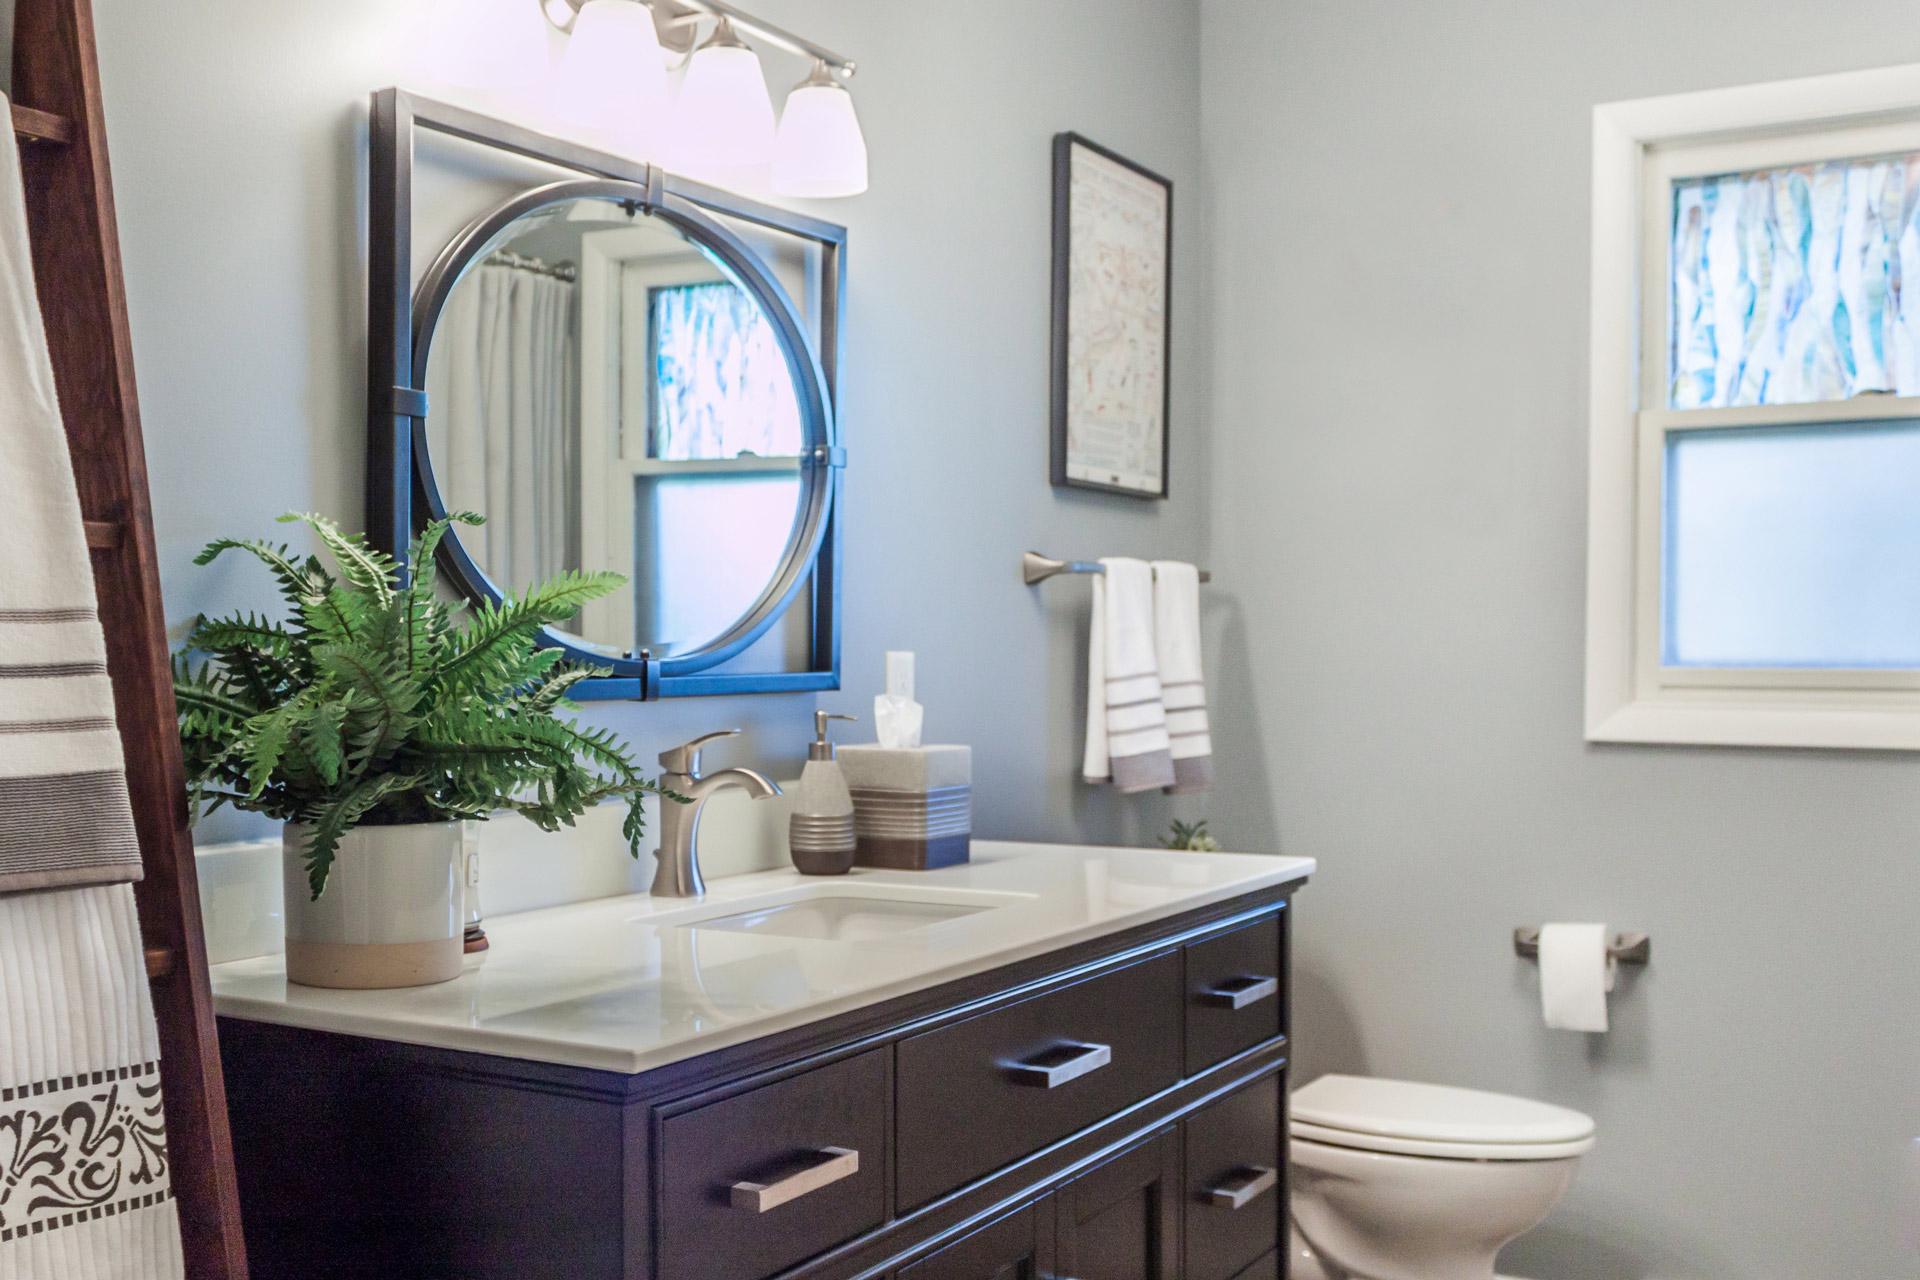 Home-Improvement-Design-Build-Remodeling-Madison-Wisconsin-4.jpg